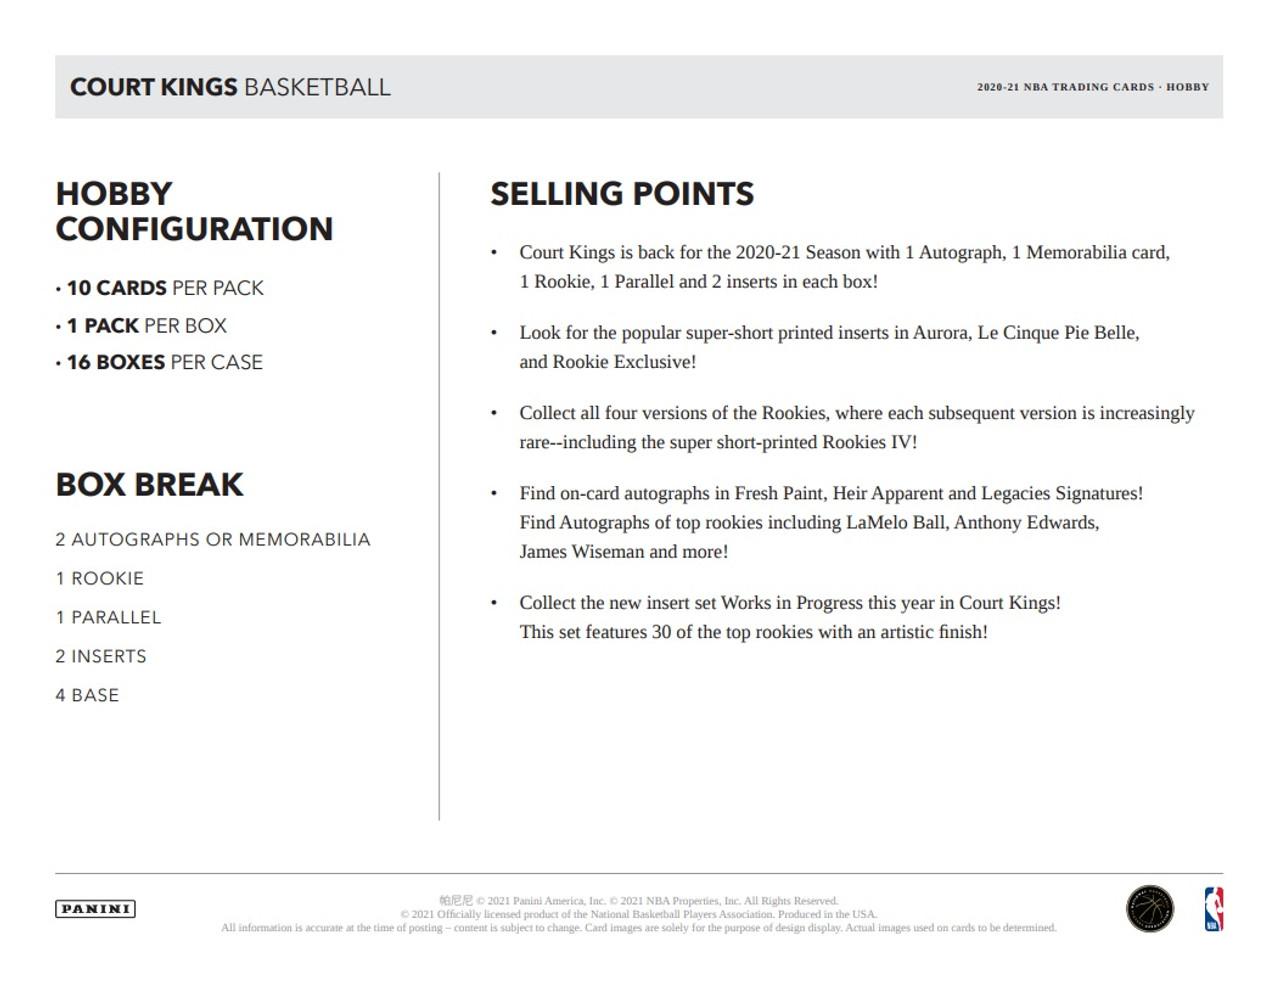 2020/21 Panini Court Kings Basketball Hobby Box